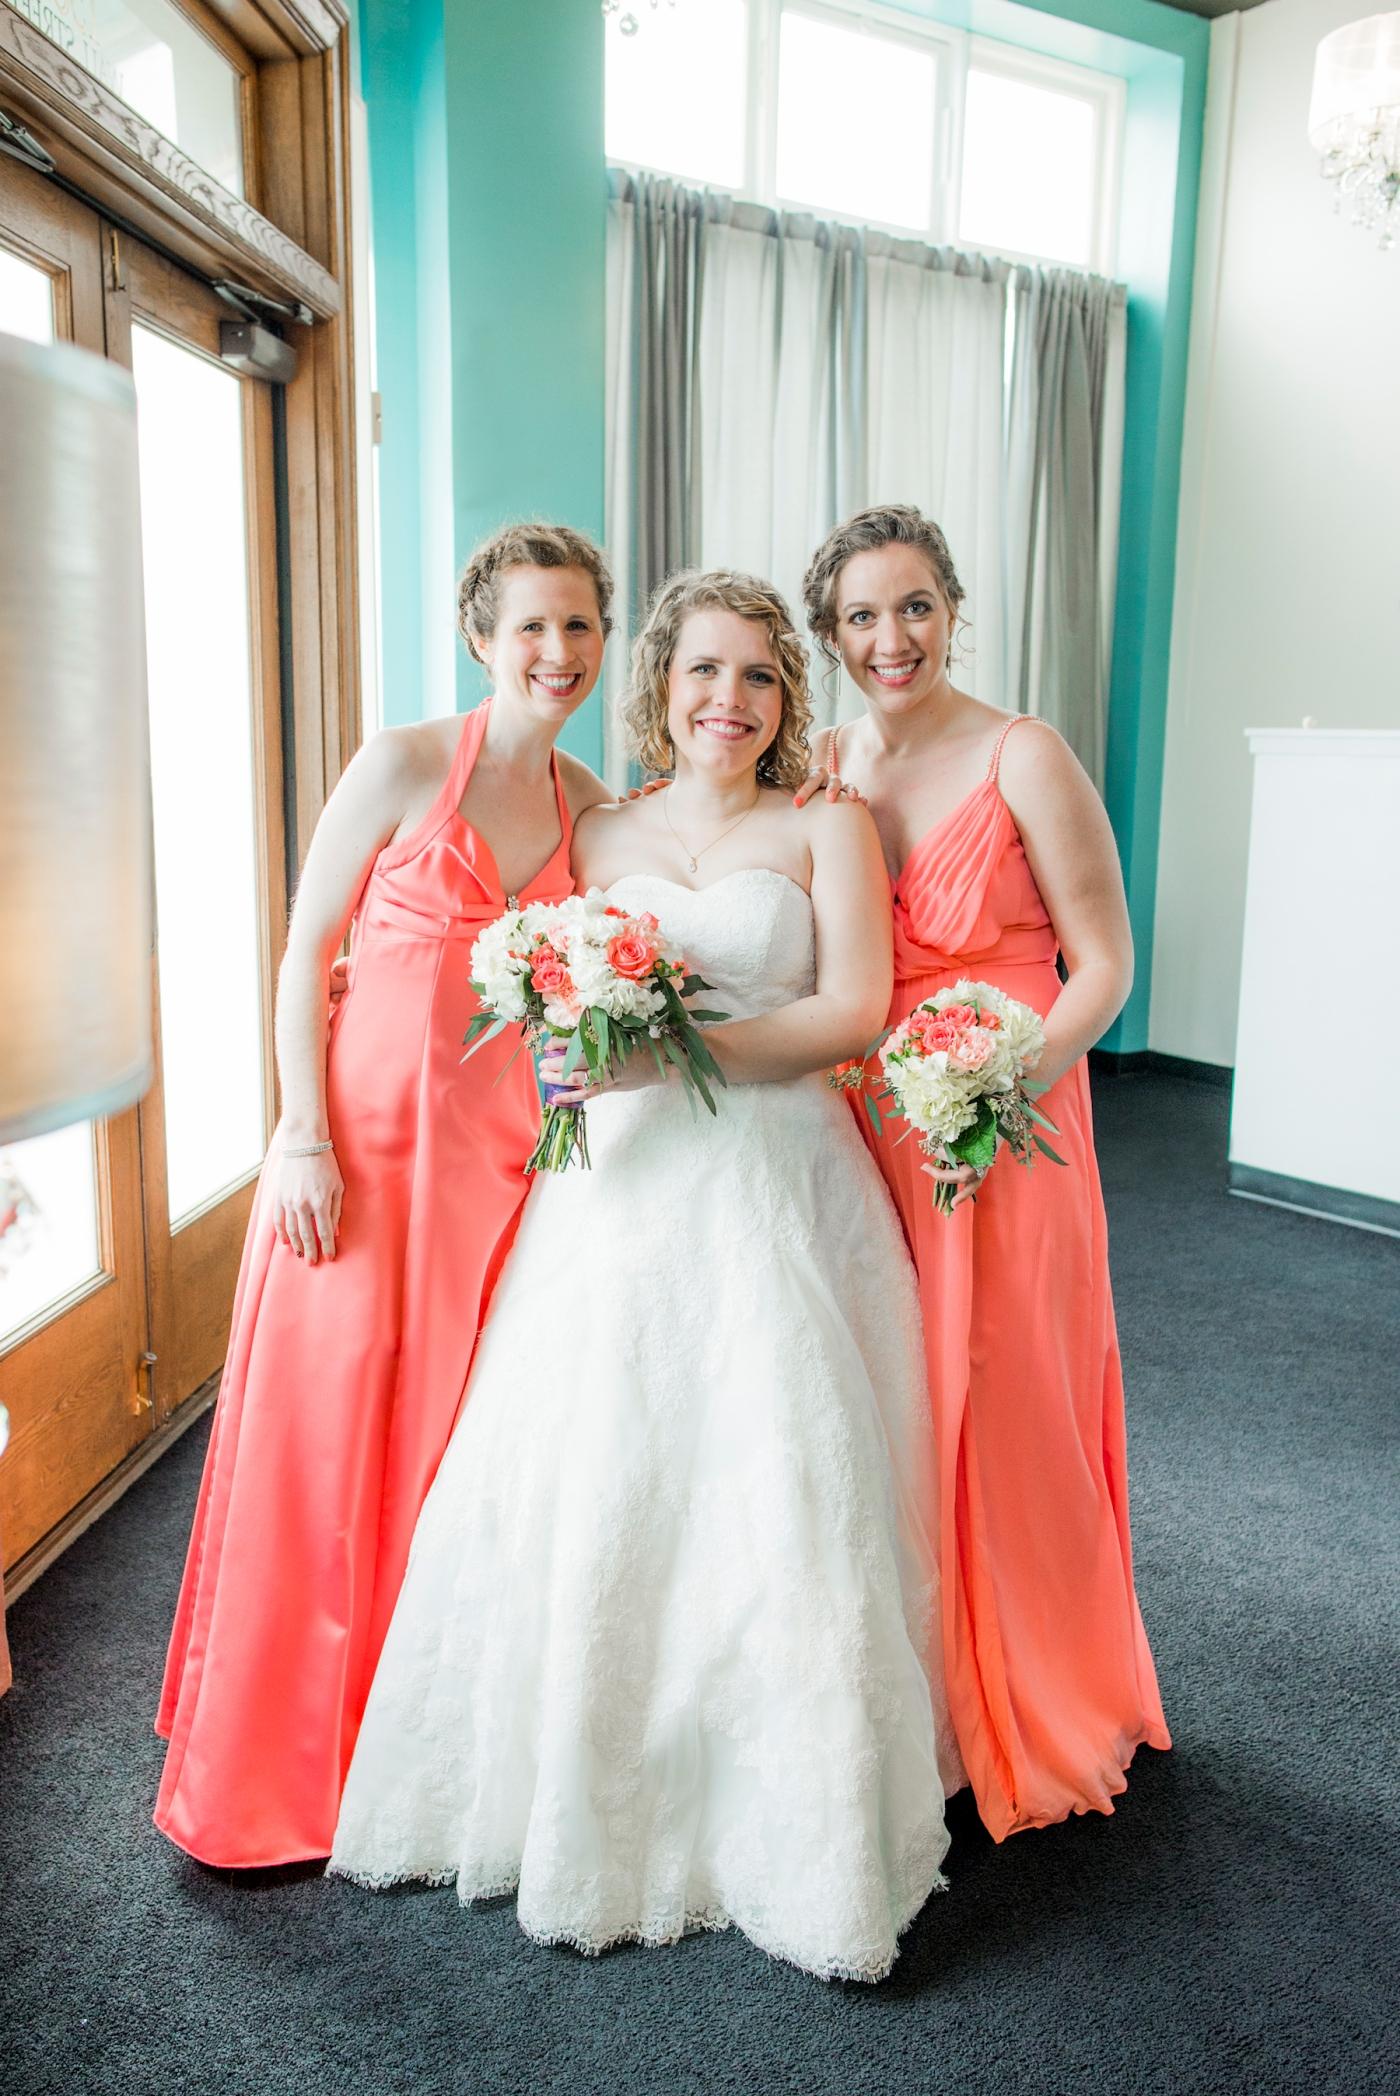 DSC_2870Everett_Wedding_Ballroom_Jane_Speleers_photography_Rachel_and_Edmund_bridesmaids_2017